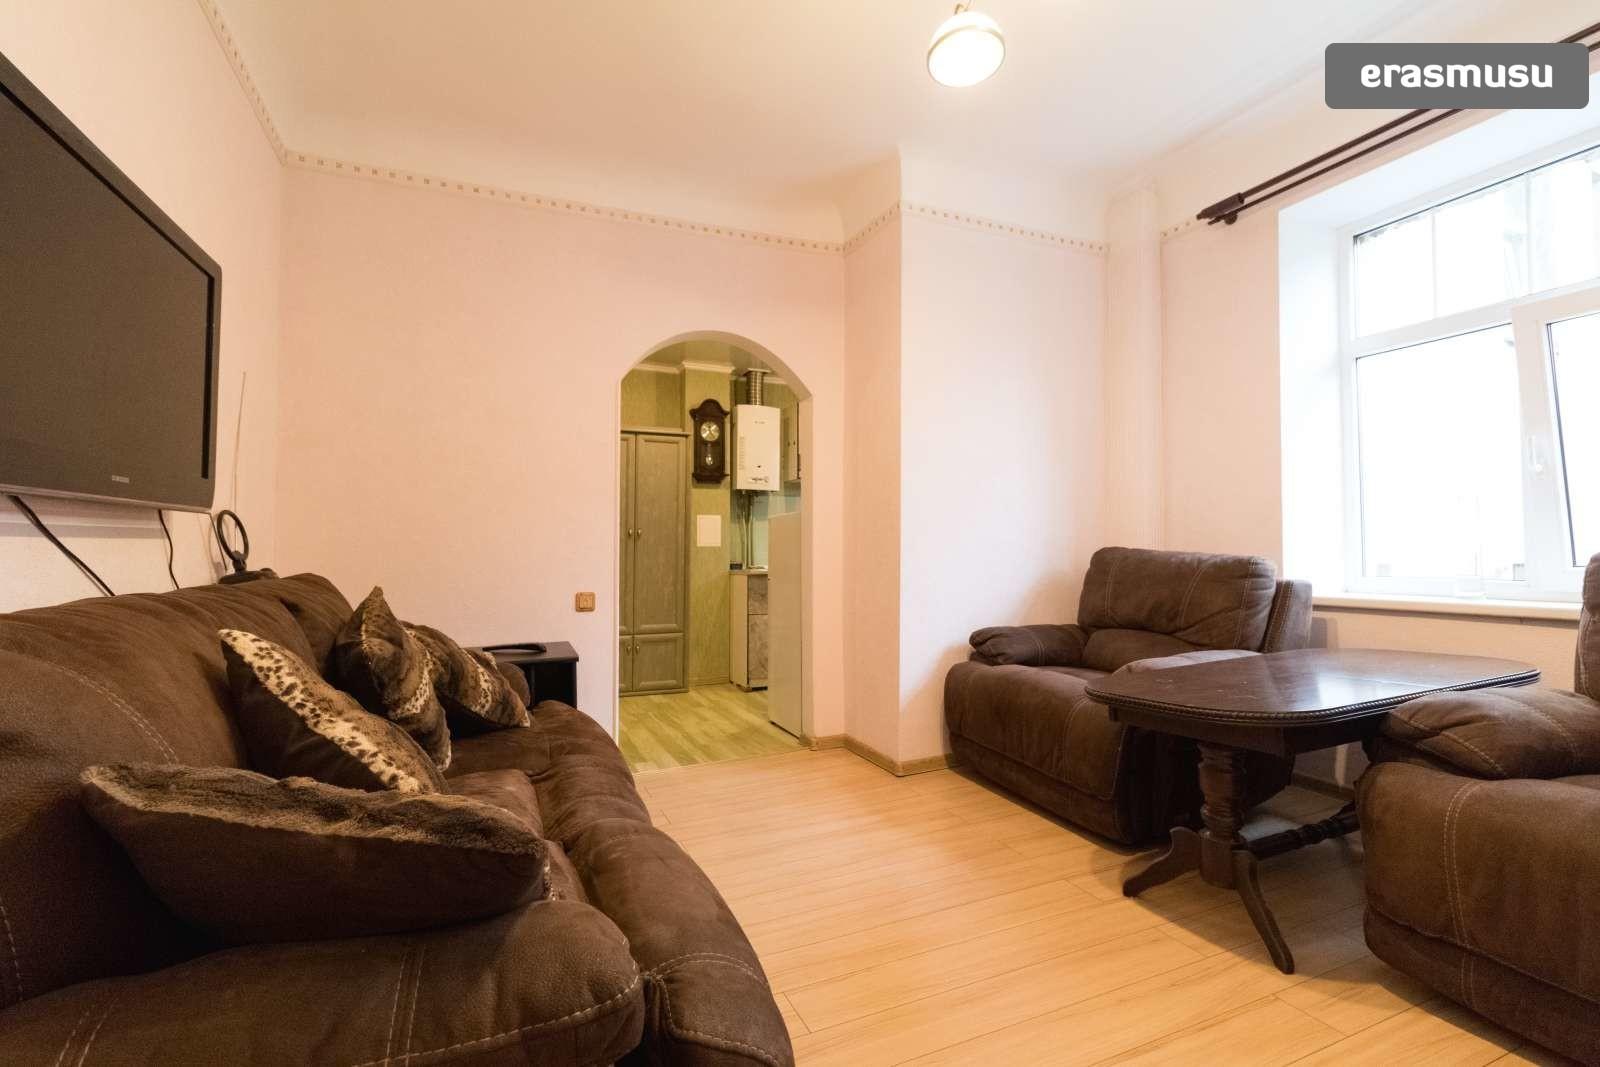 cozy-1-bedroom-apartment-rent-avoti-729bb882c22680aea83b0dbfec9e